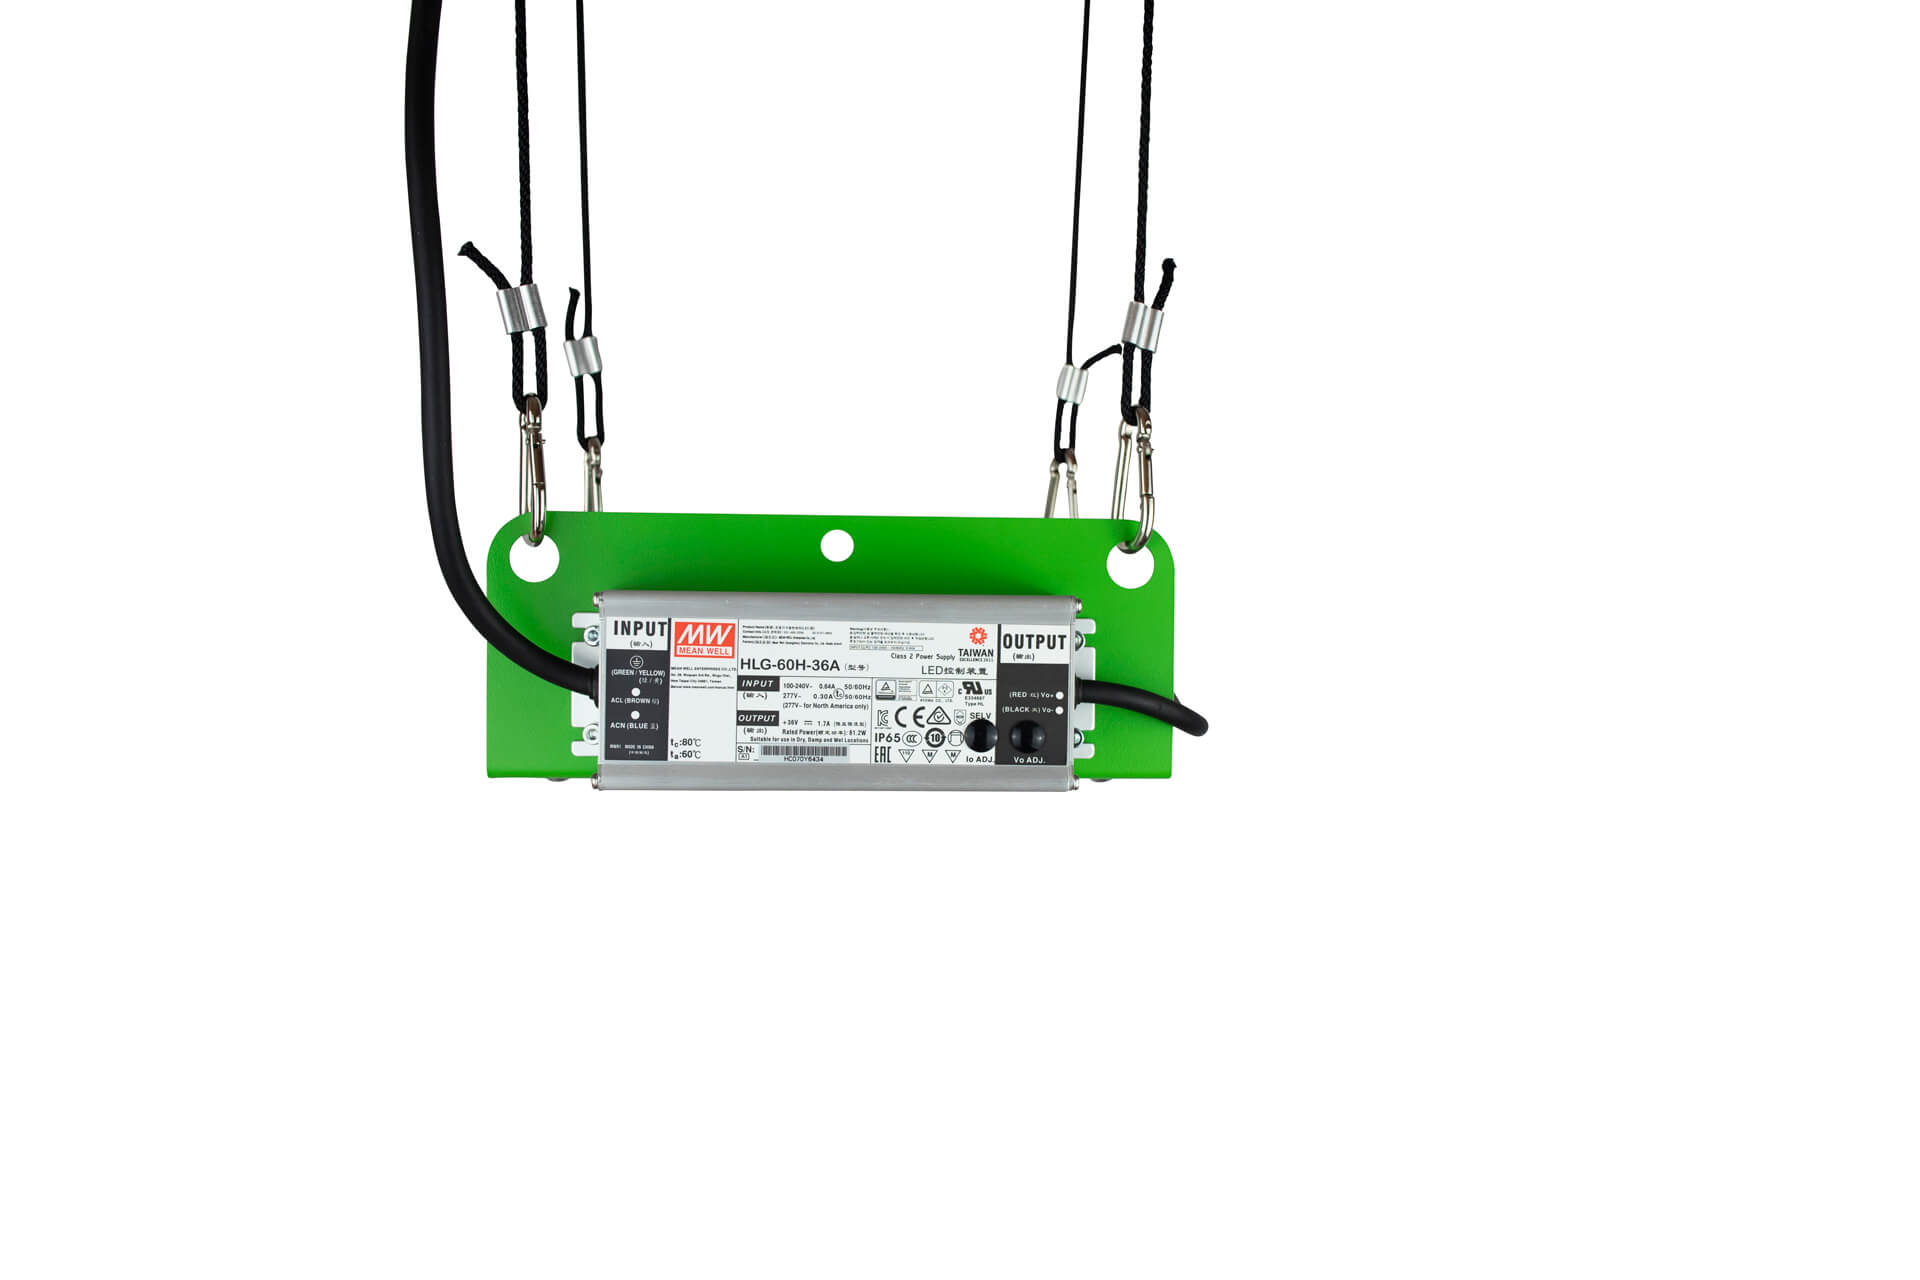 DIY-M-KIT-SMD-60w-Front-pro-emit-onlineshop